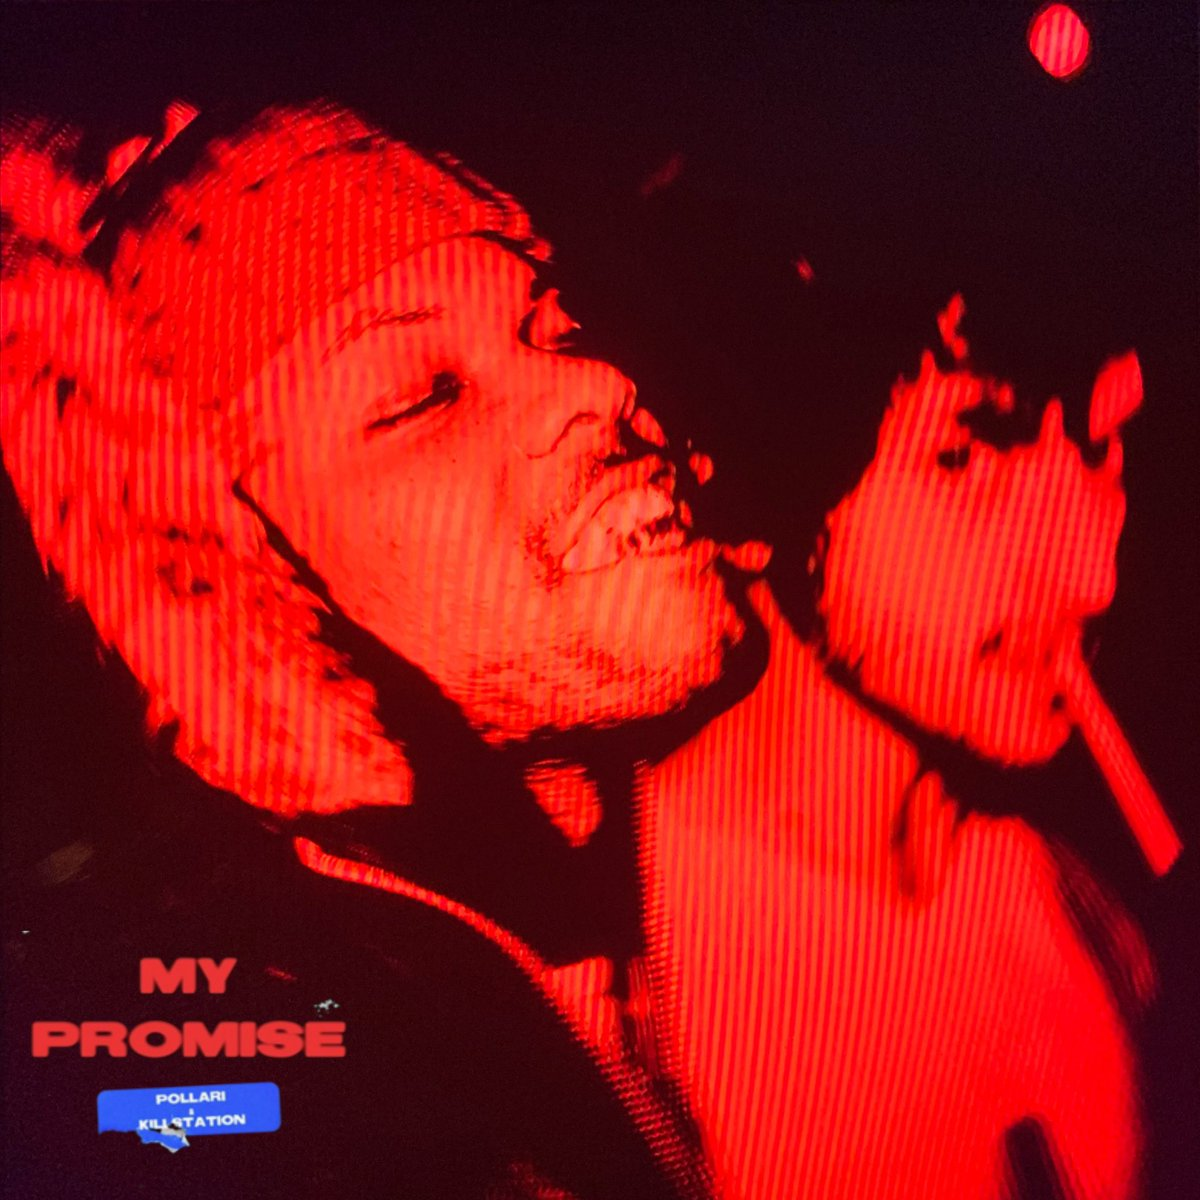 "POLLÀRI & KILLSTATION ""MY PROMISE"" bit.ly/3f9sLGr"